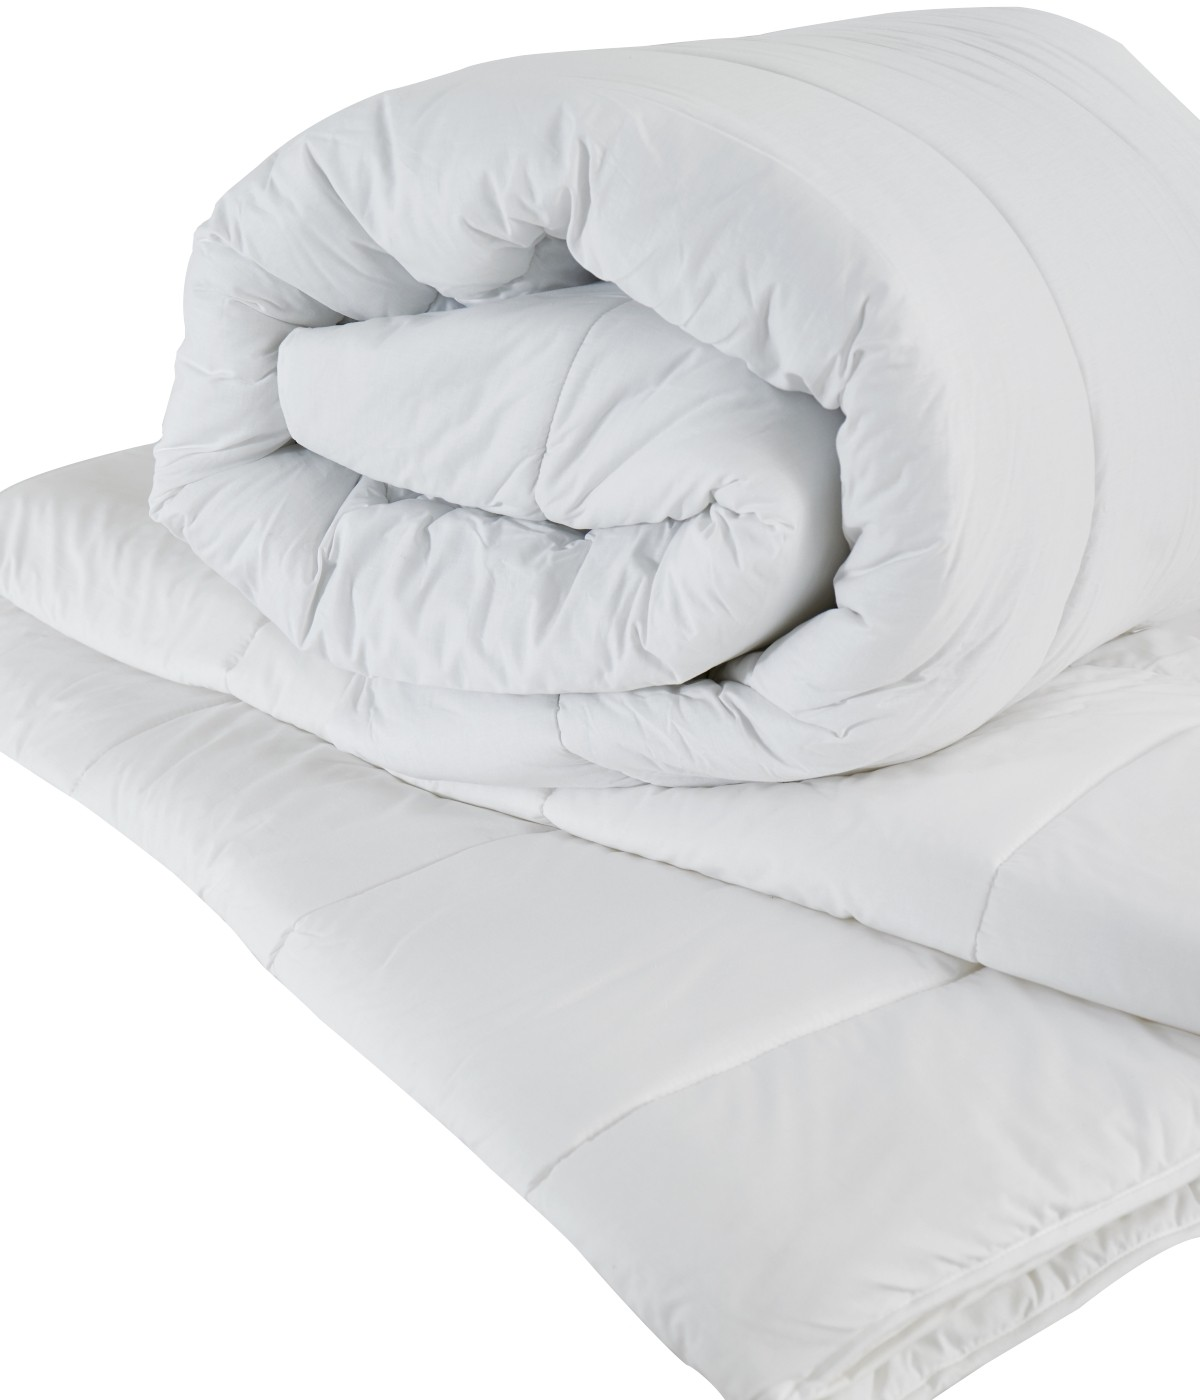 Comforter, PLUMASA SLIM